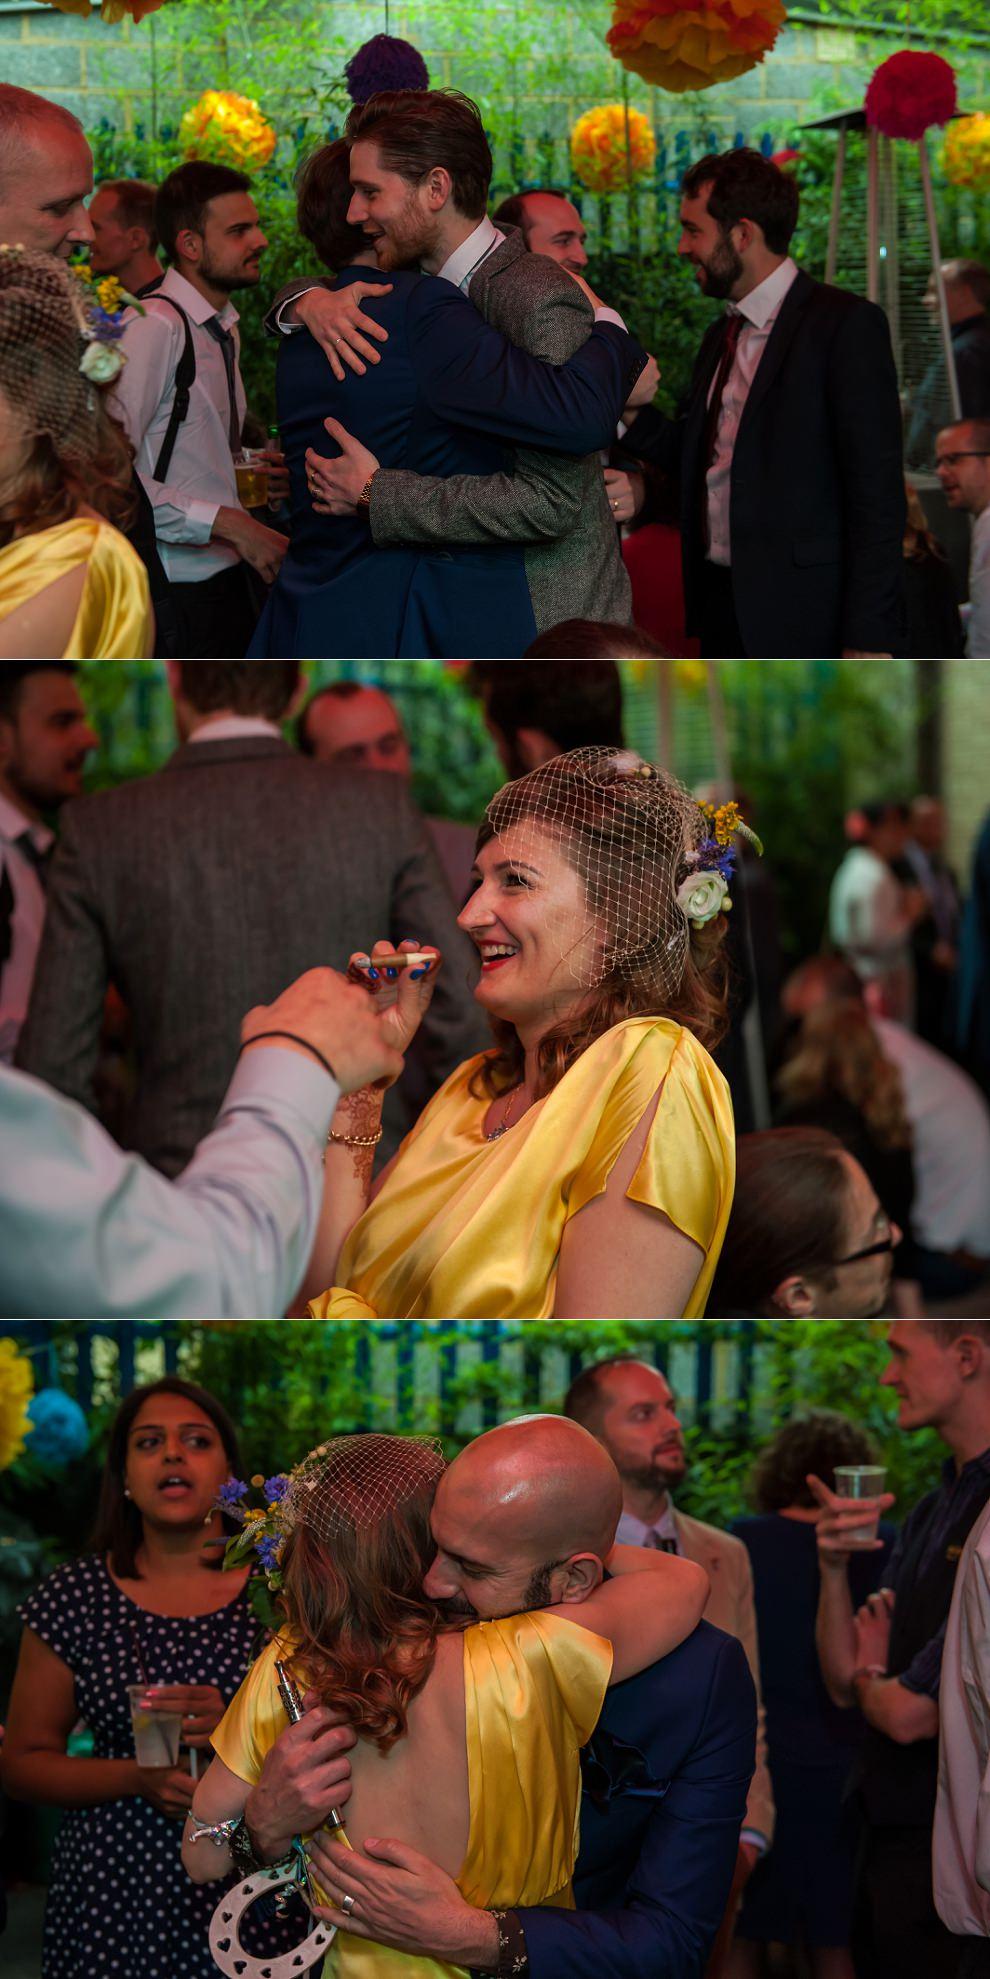 Wedding-Asylum-Peckham-Lucy-Dan-73